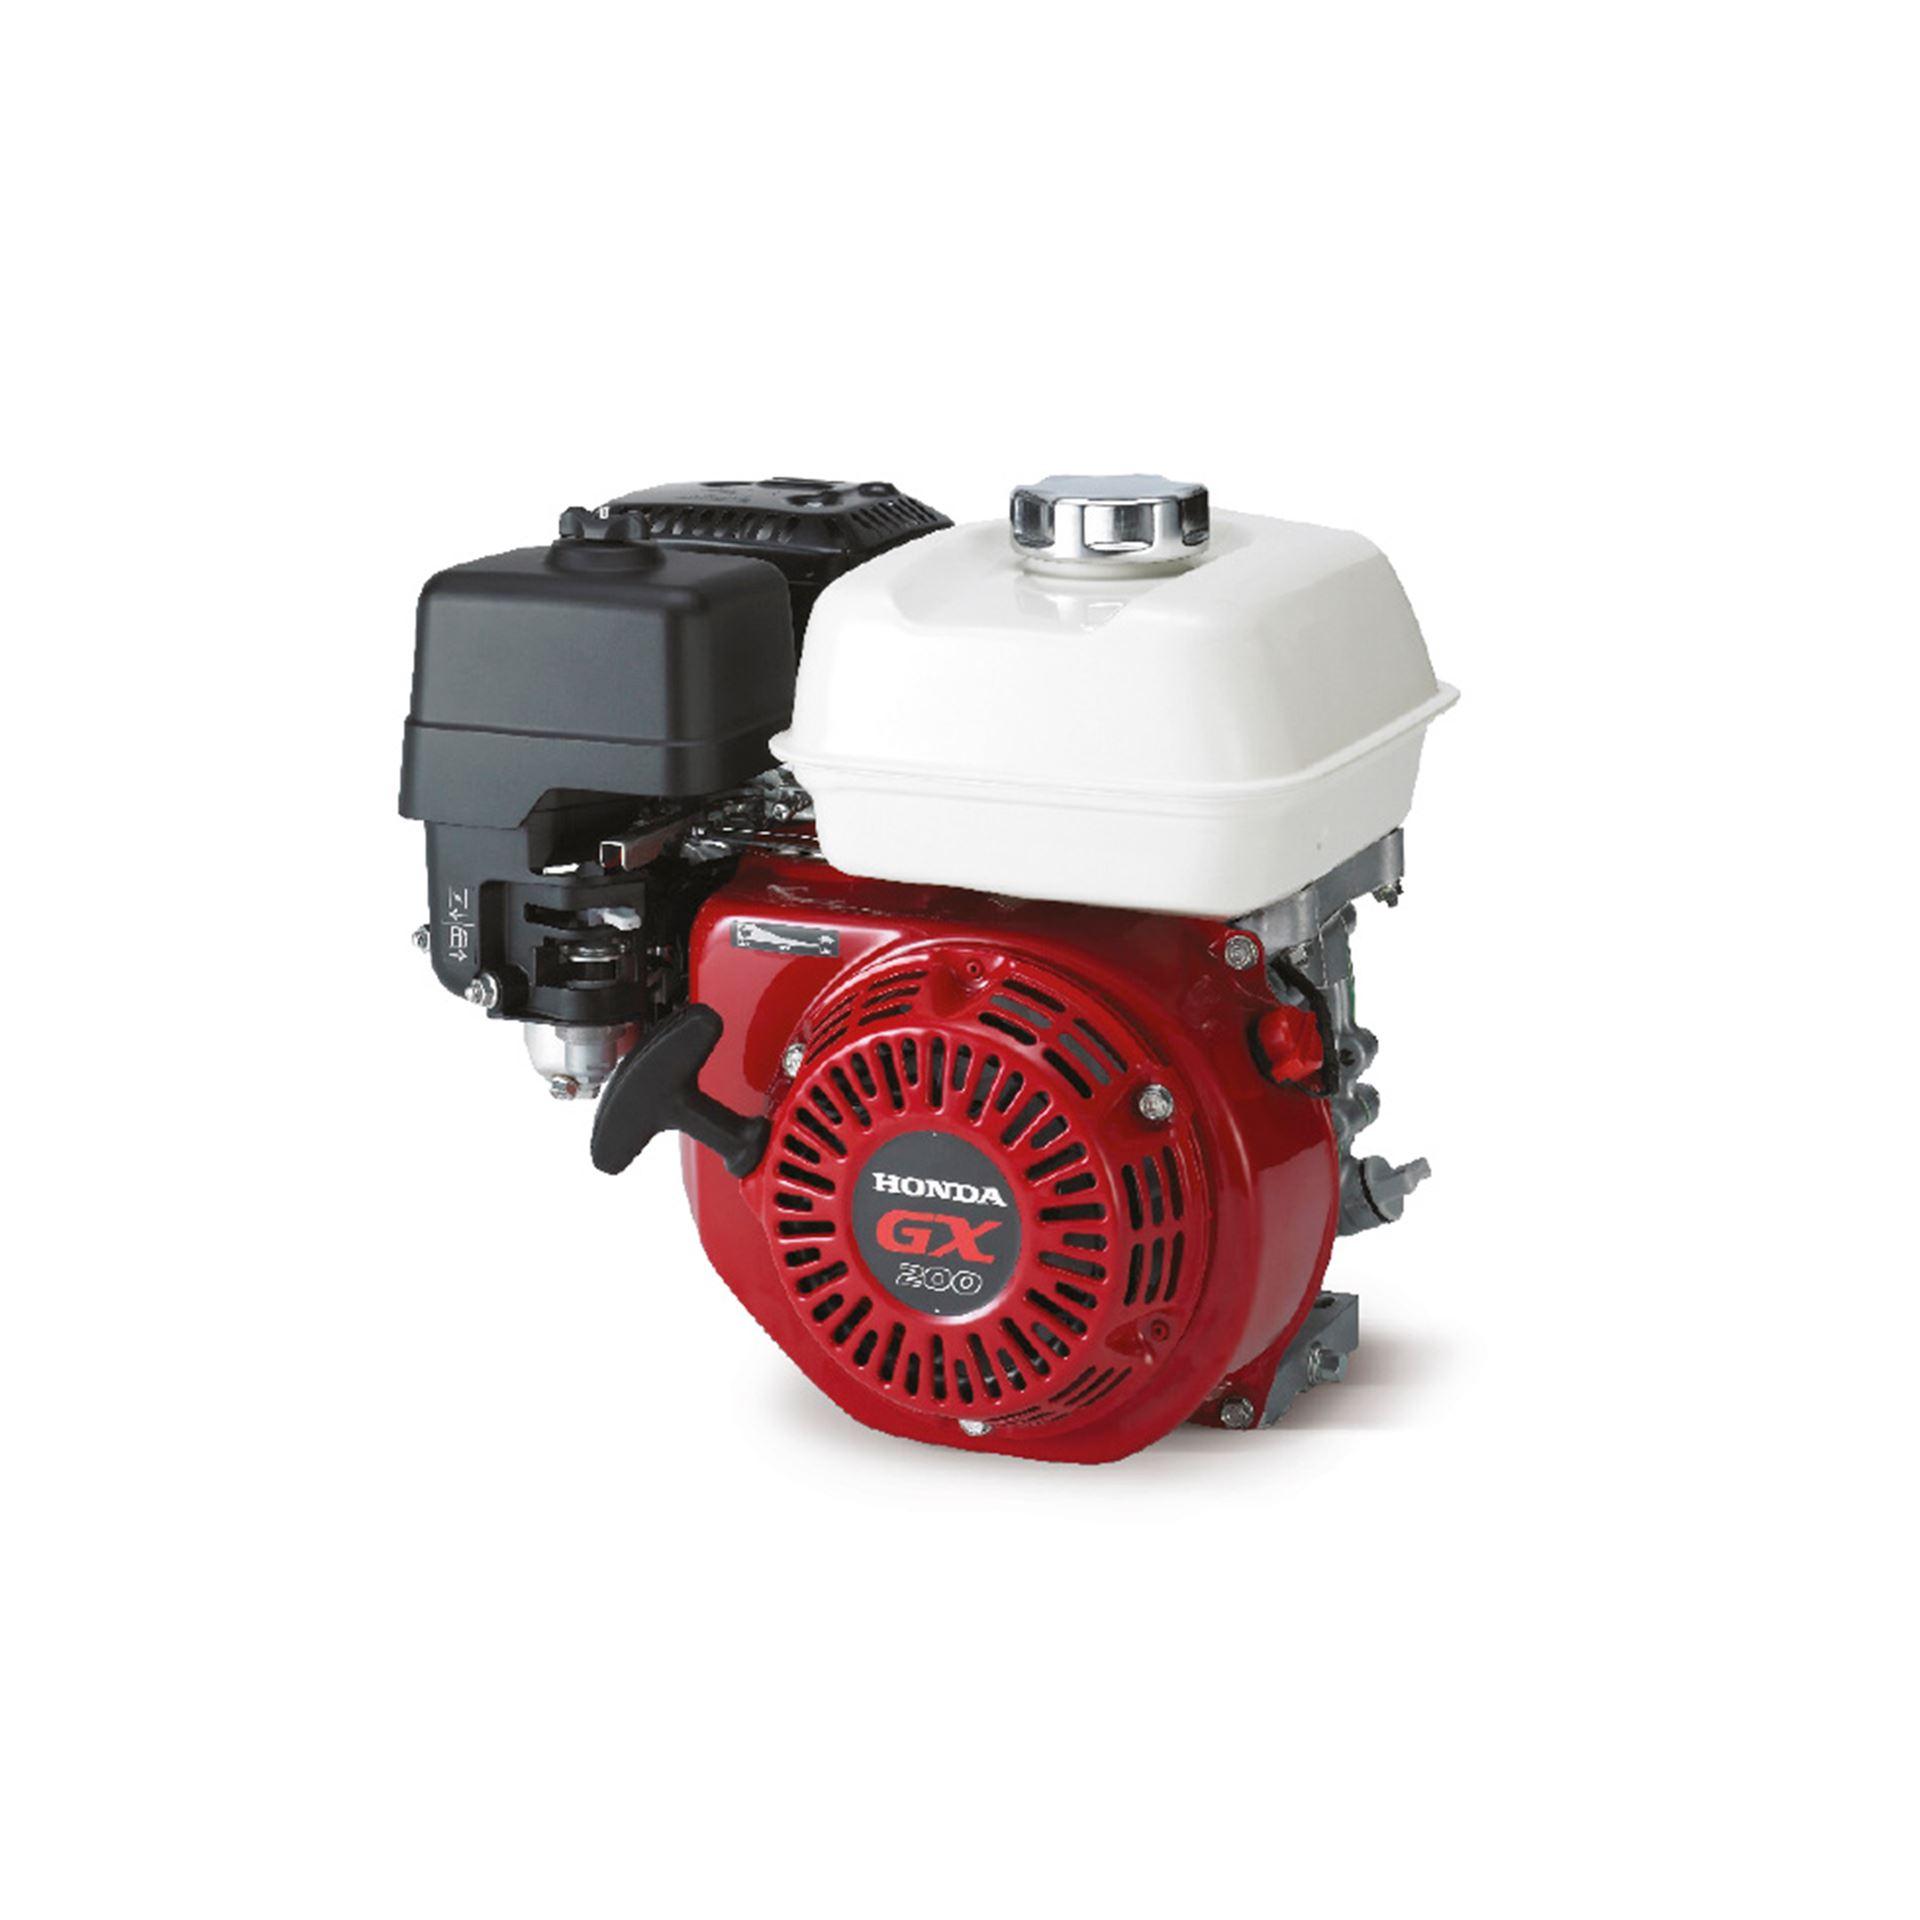 Imagen de Bandeja vibrante Imcoinsa 2I218 motor Honda